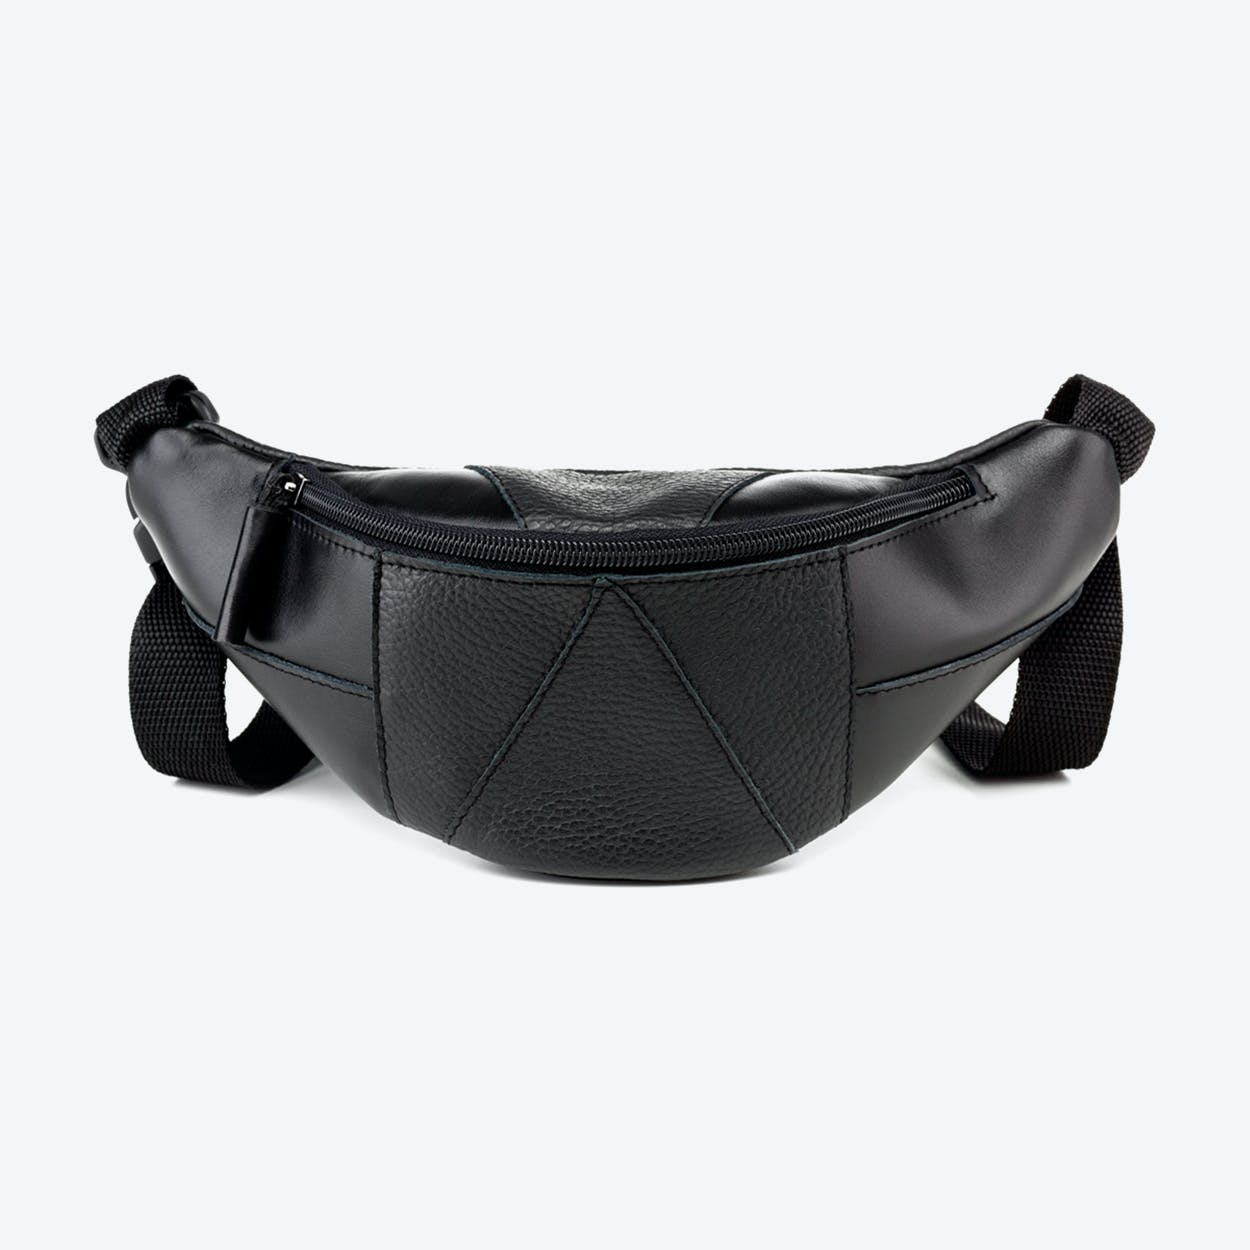 Banana Belt Bag Black